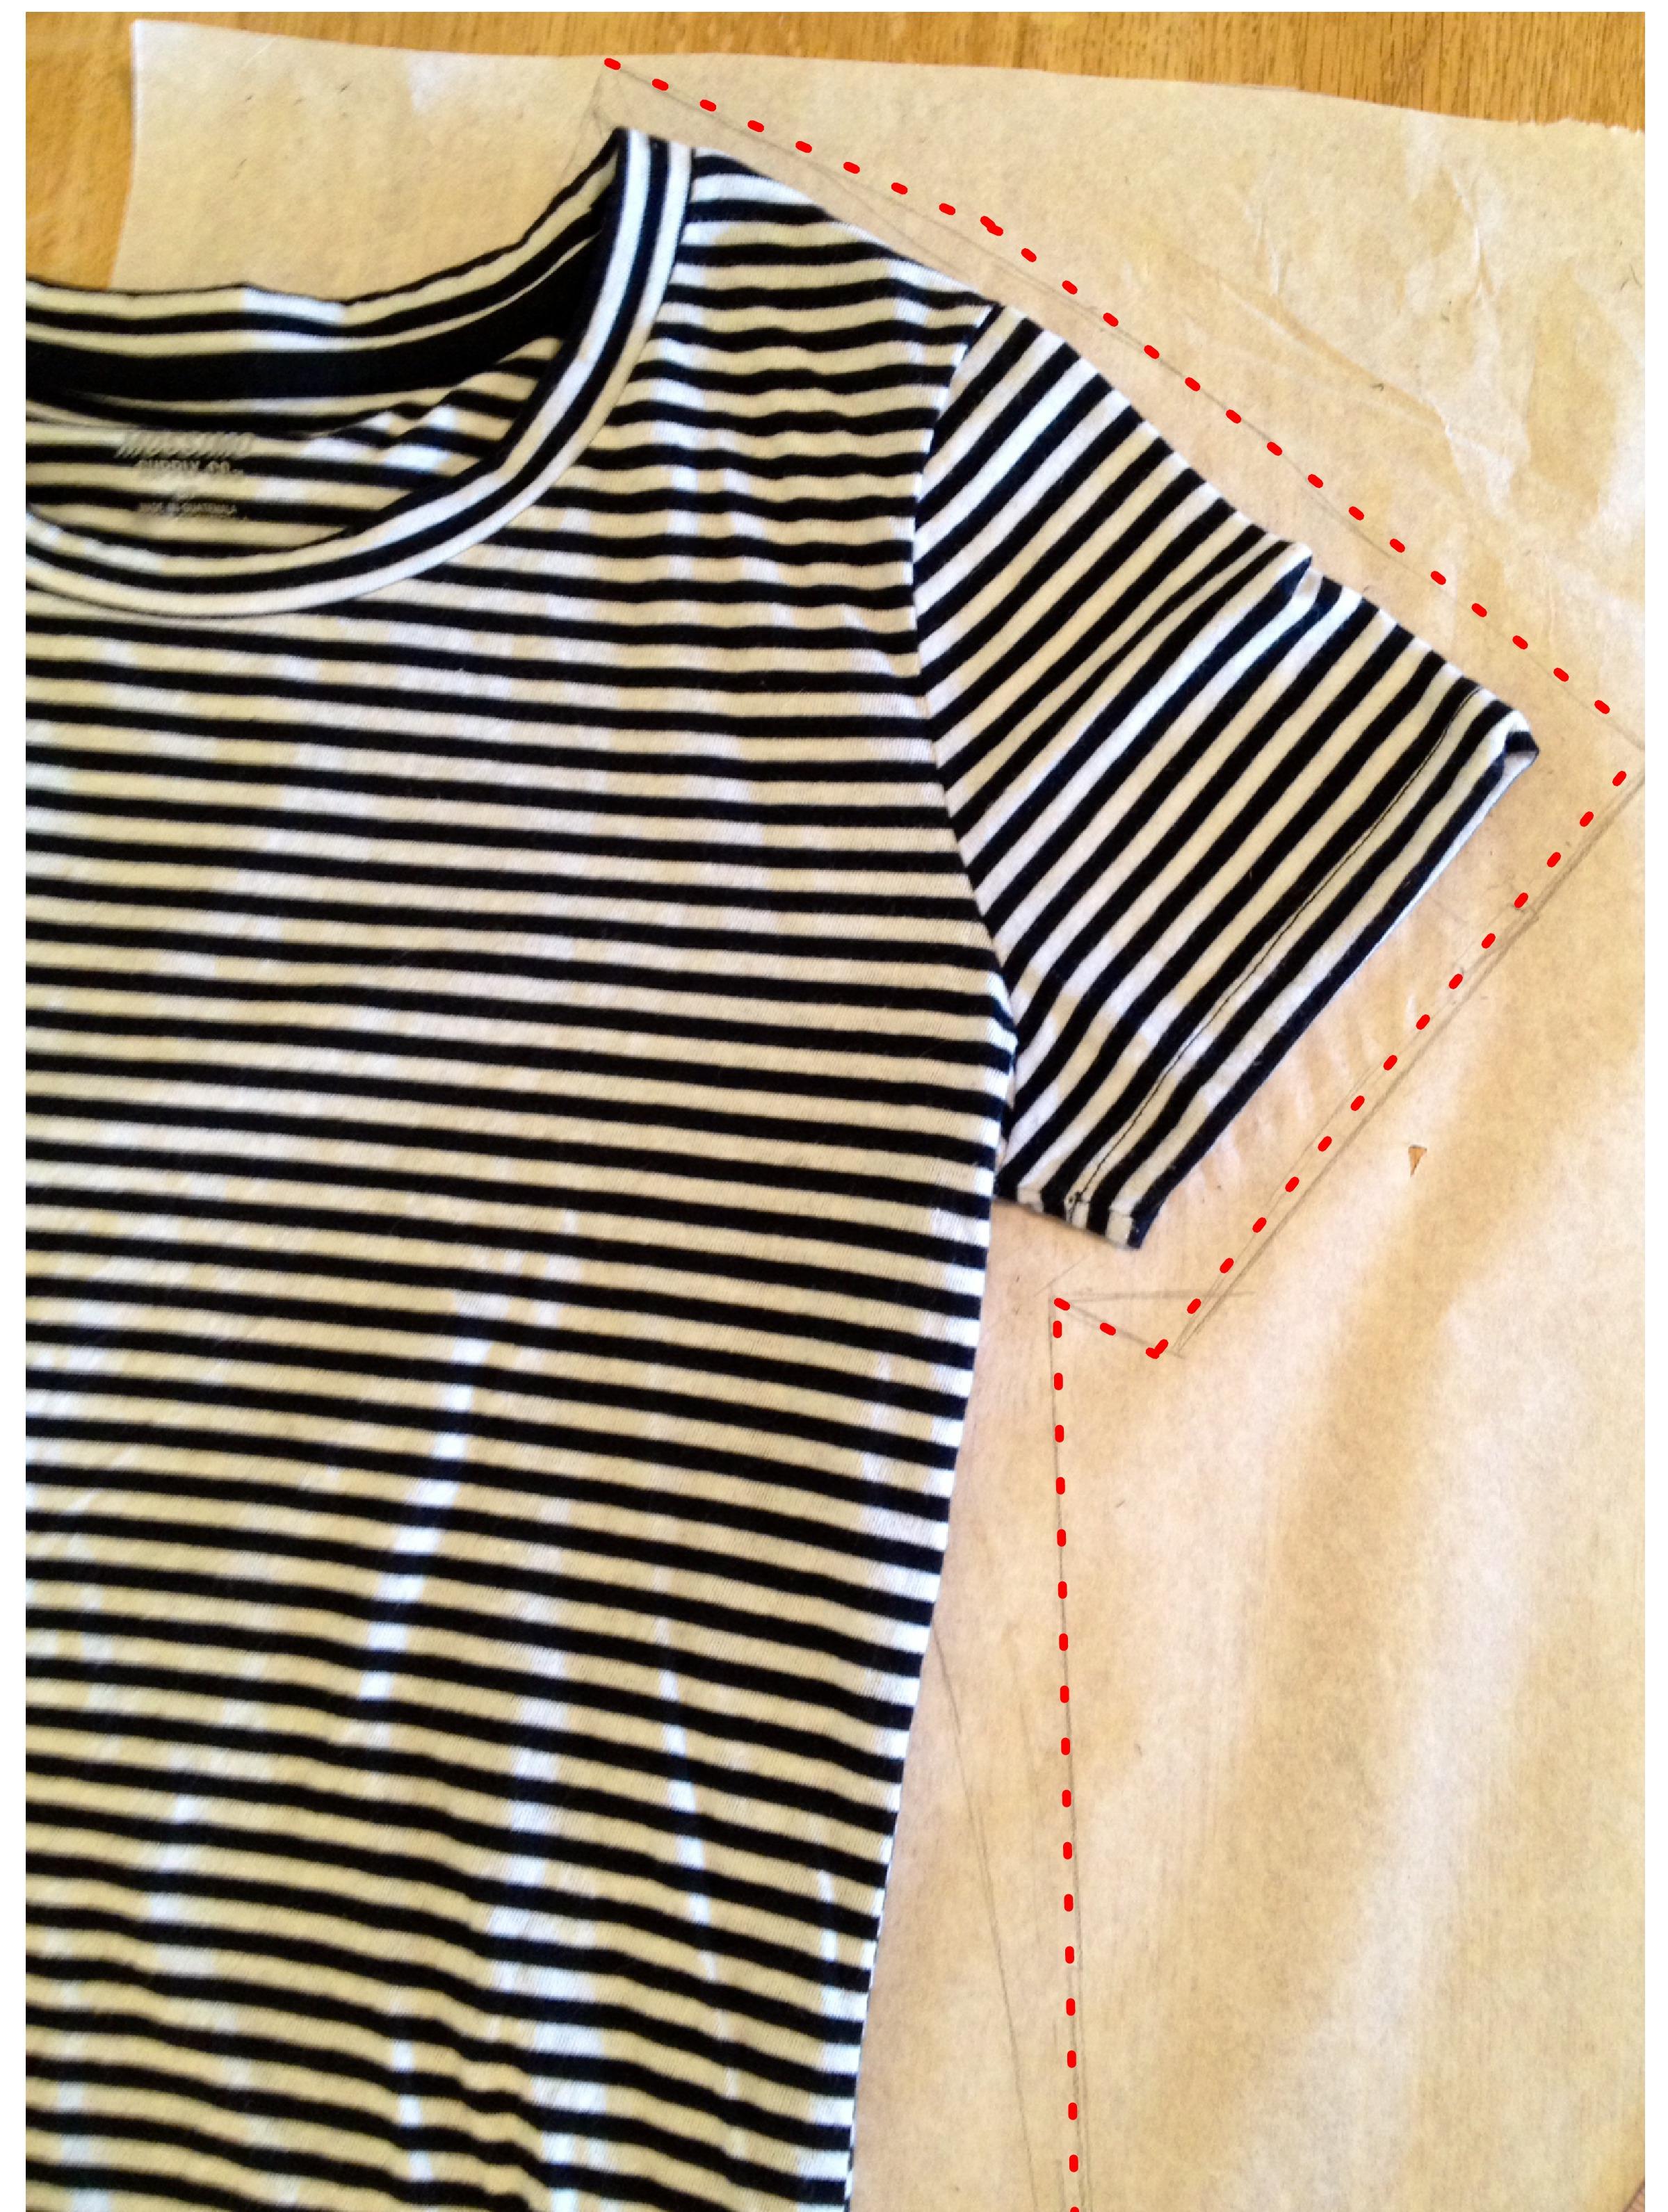 Knit Raglan Sleeve T-Shirt Dress Sewing Tutorial The Sara Project